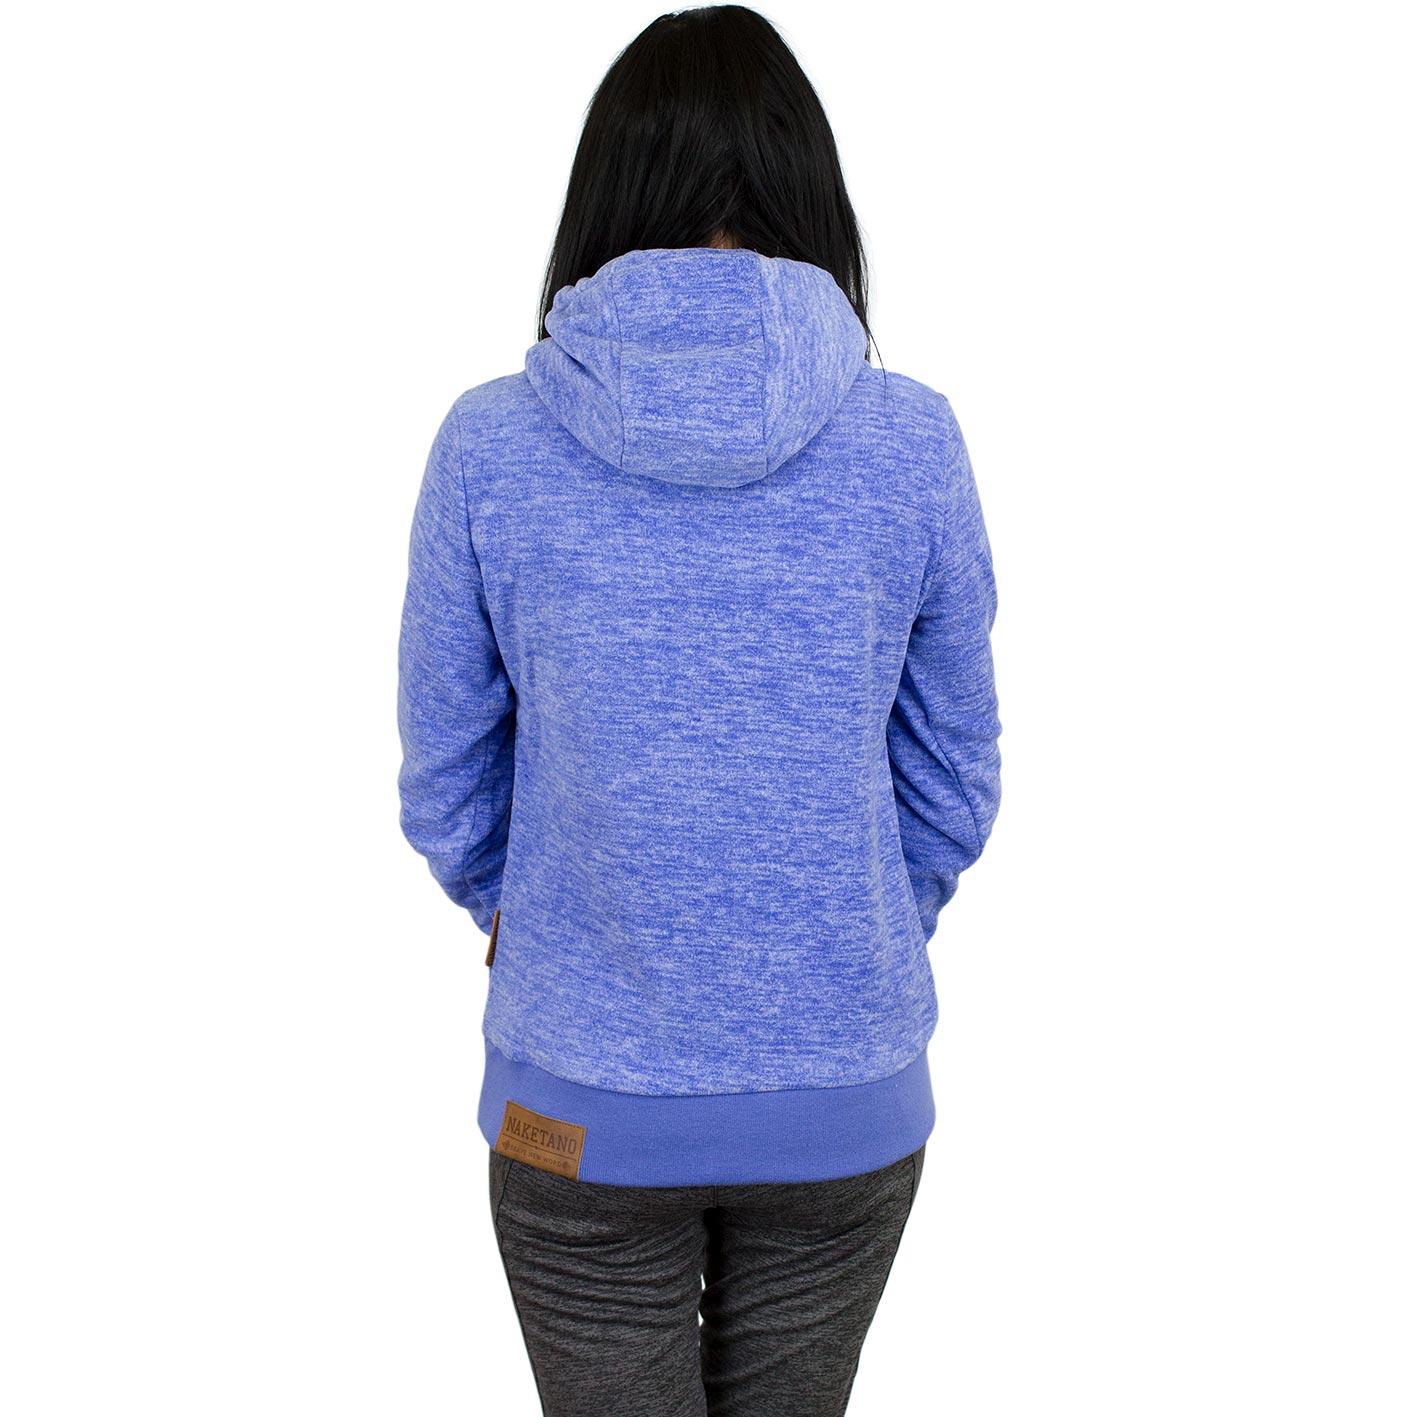 naketano damen hoodie kanisterkopf ii lecker blau hier. Black Bedroom Furniture Sets. Home Design Ideas